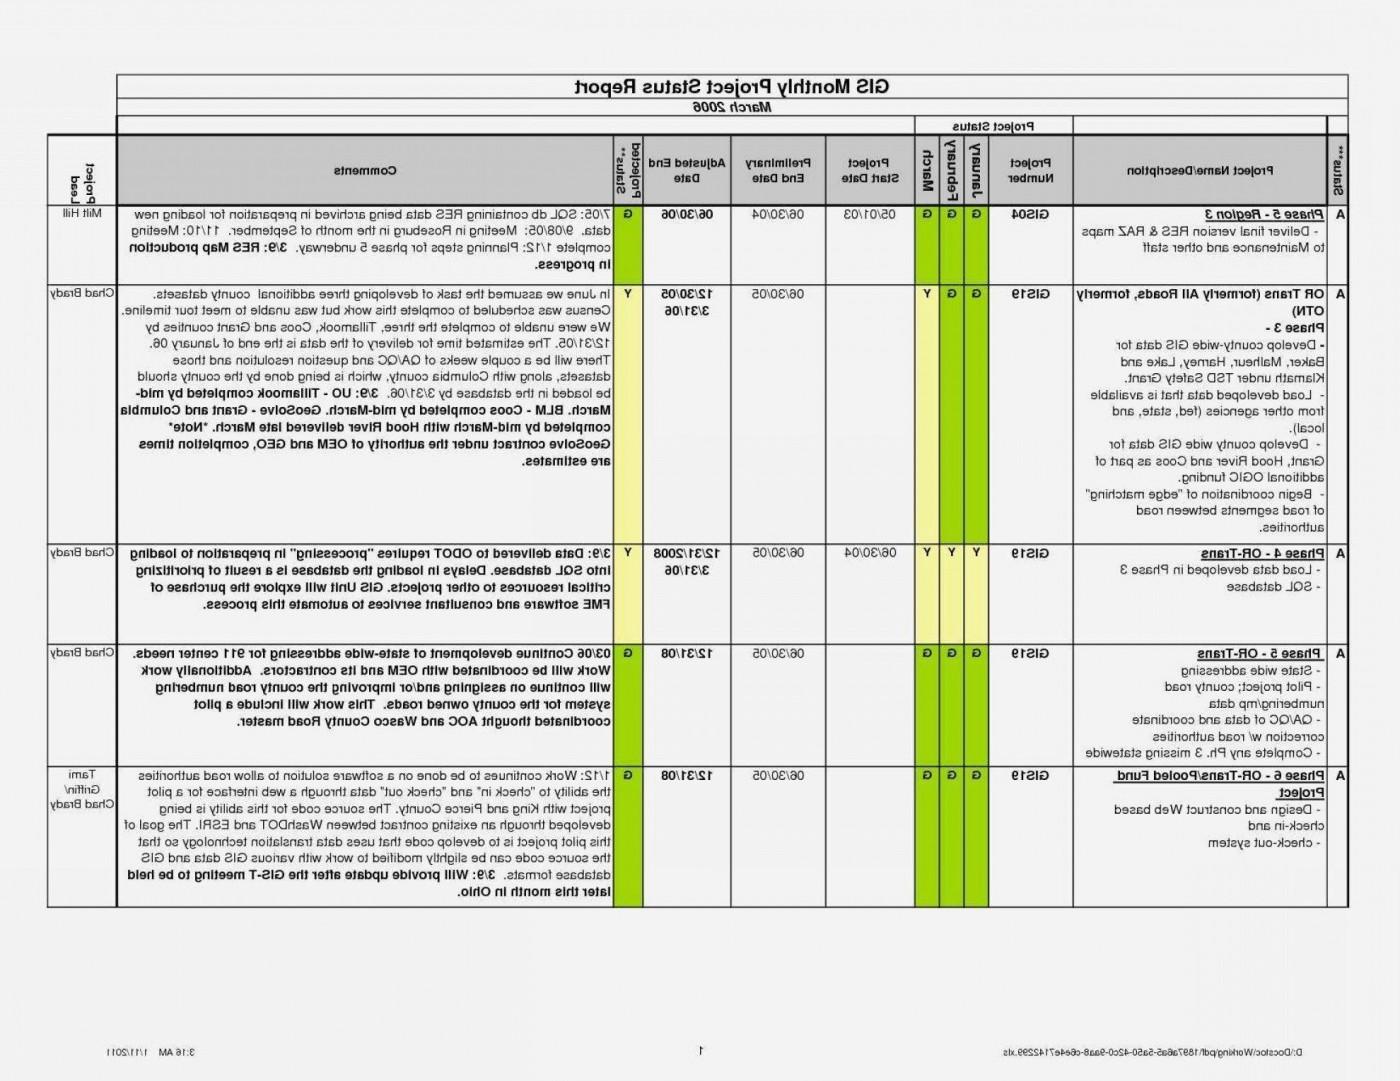 000 Impressive Project Management Statu Report Template Excel High Definition  Progres Update1400